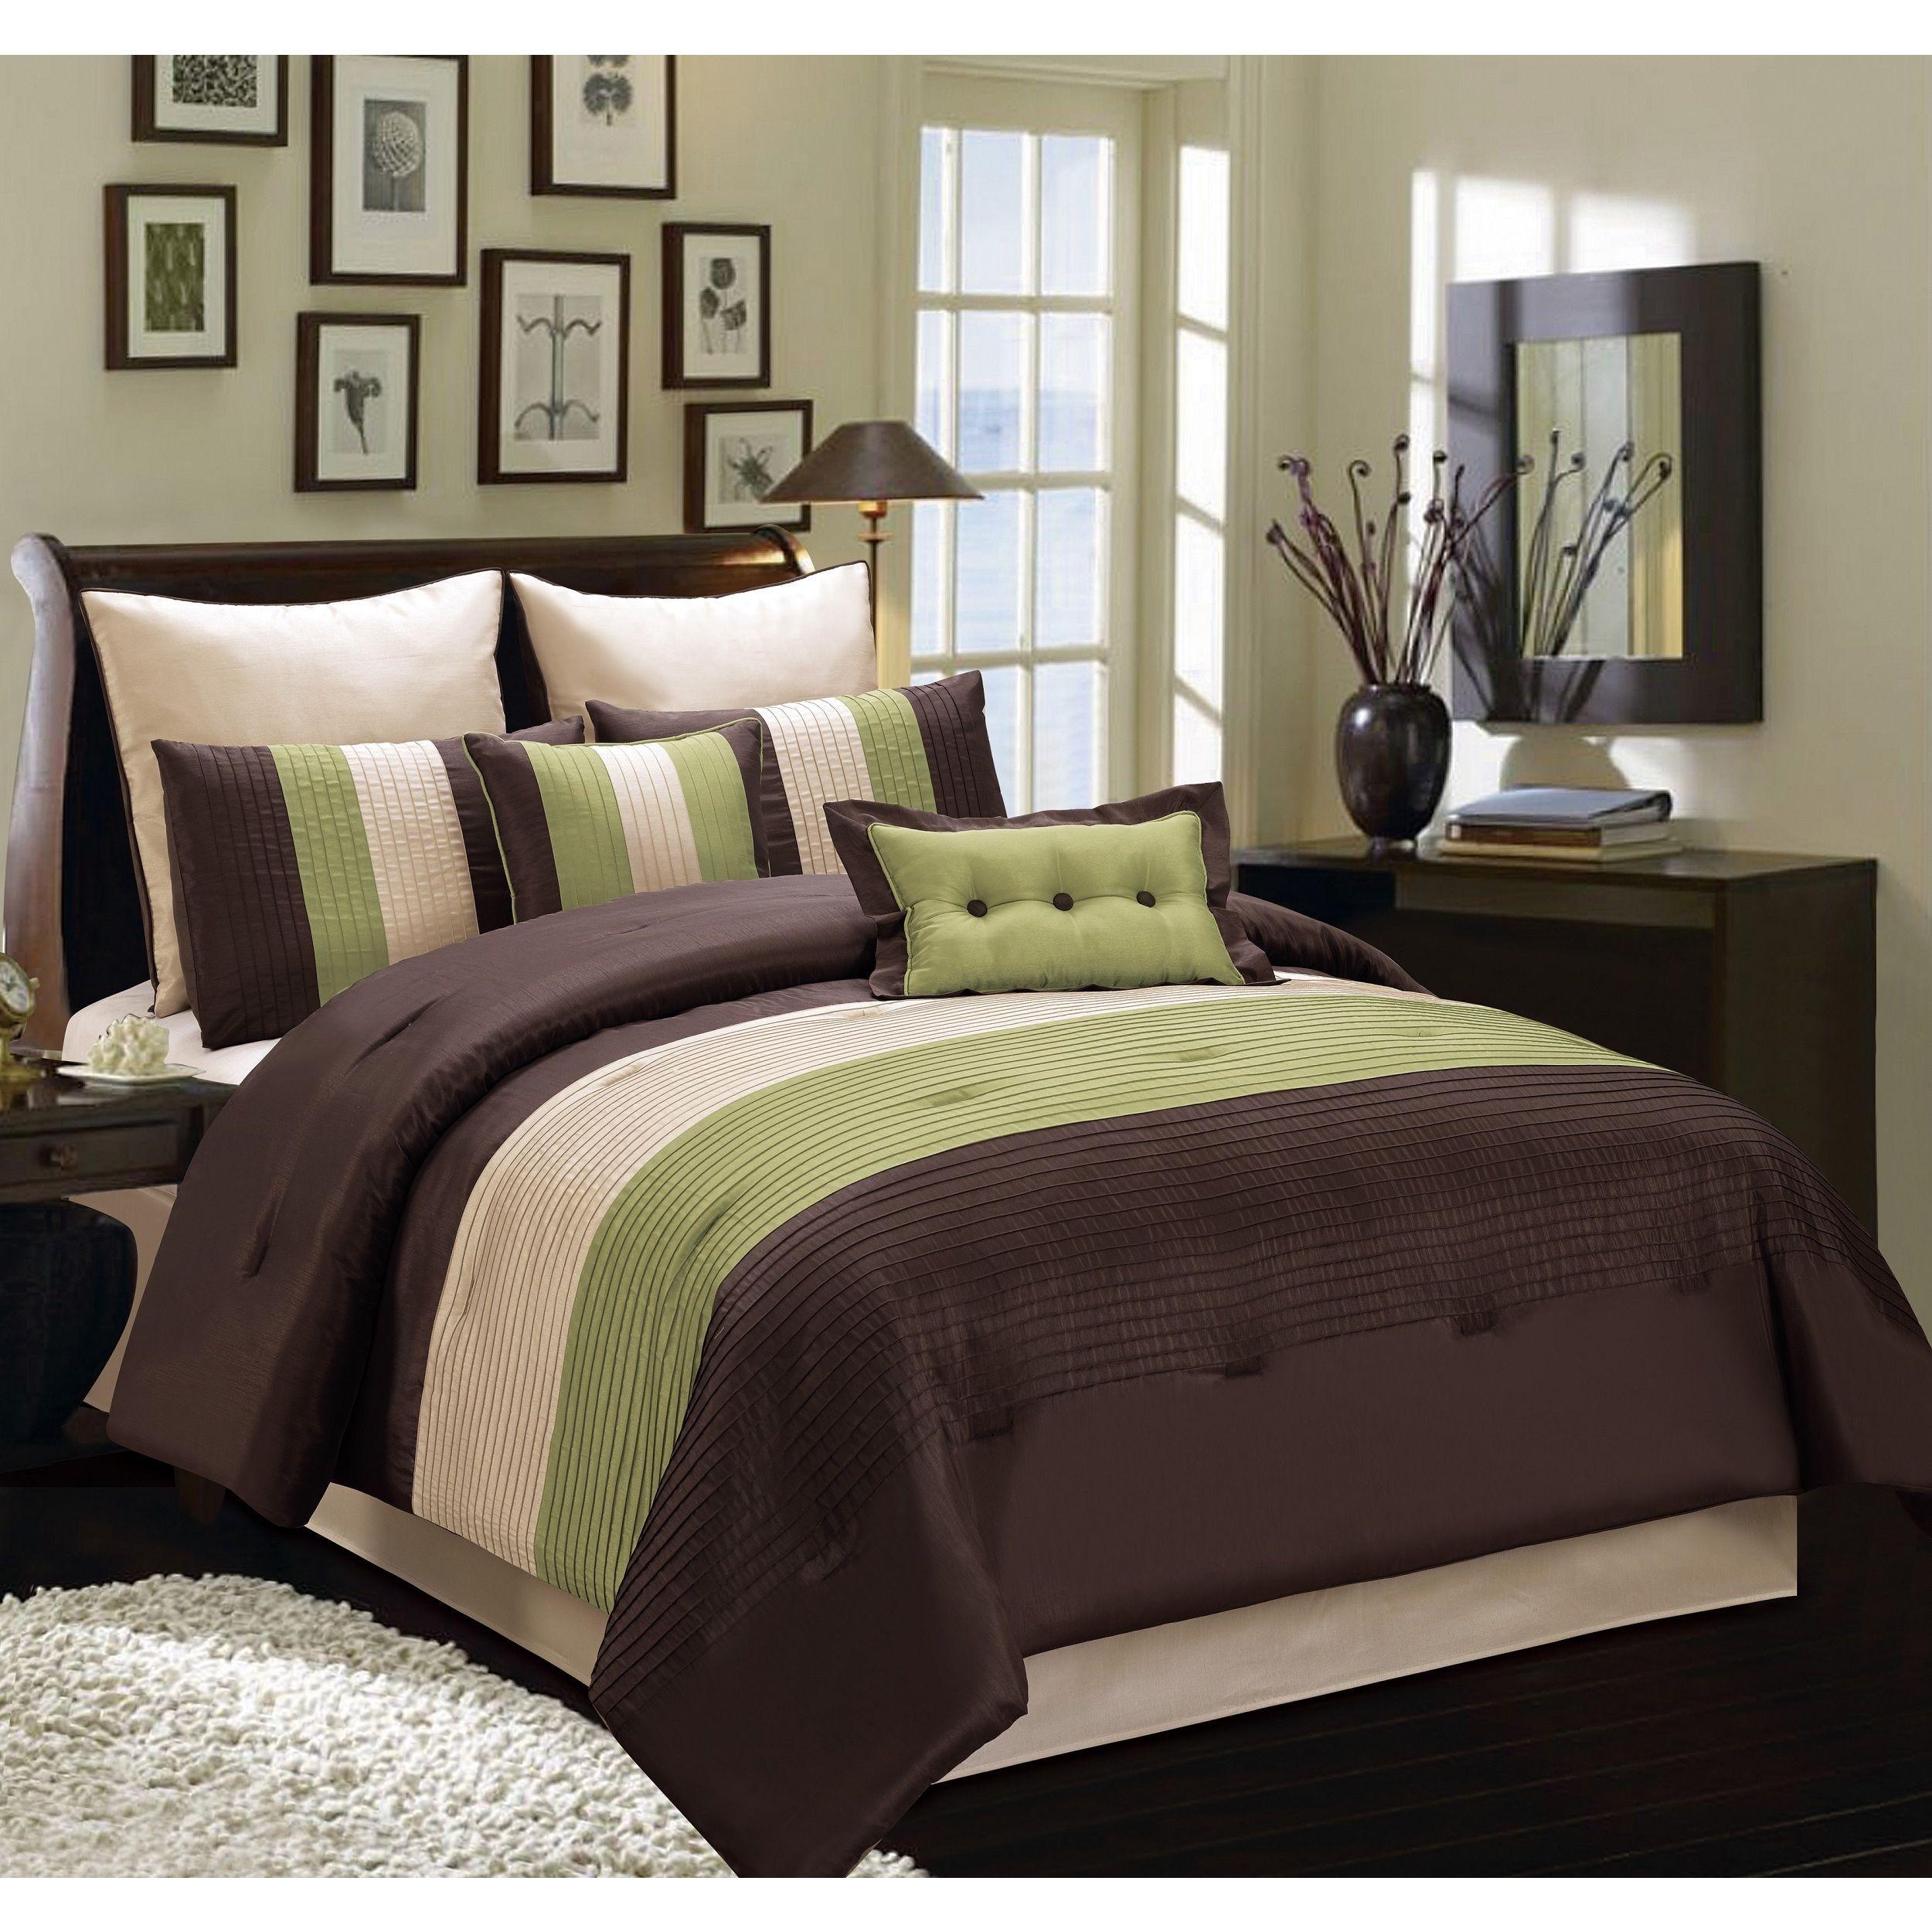 Fashion Street Clemency 8-piece Comforter Set